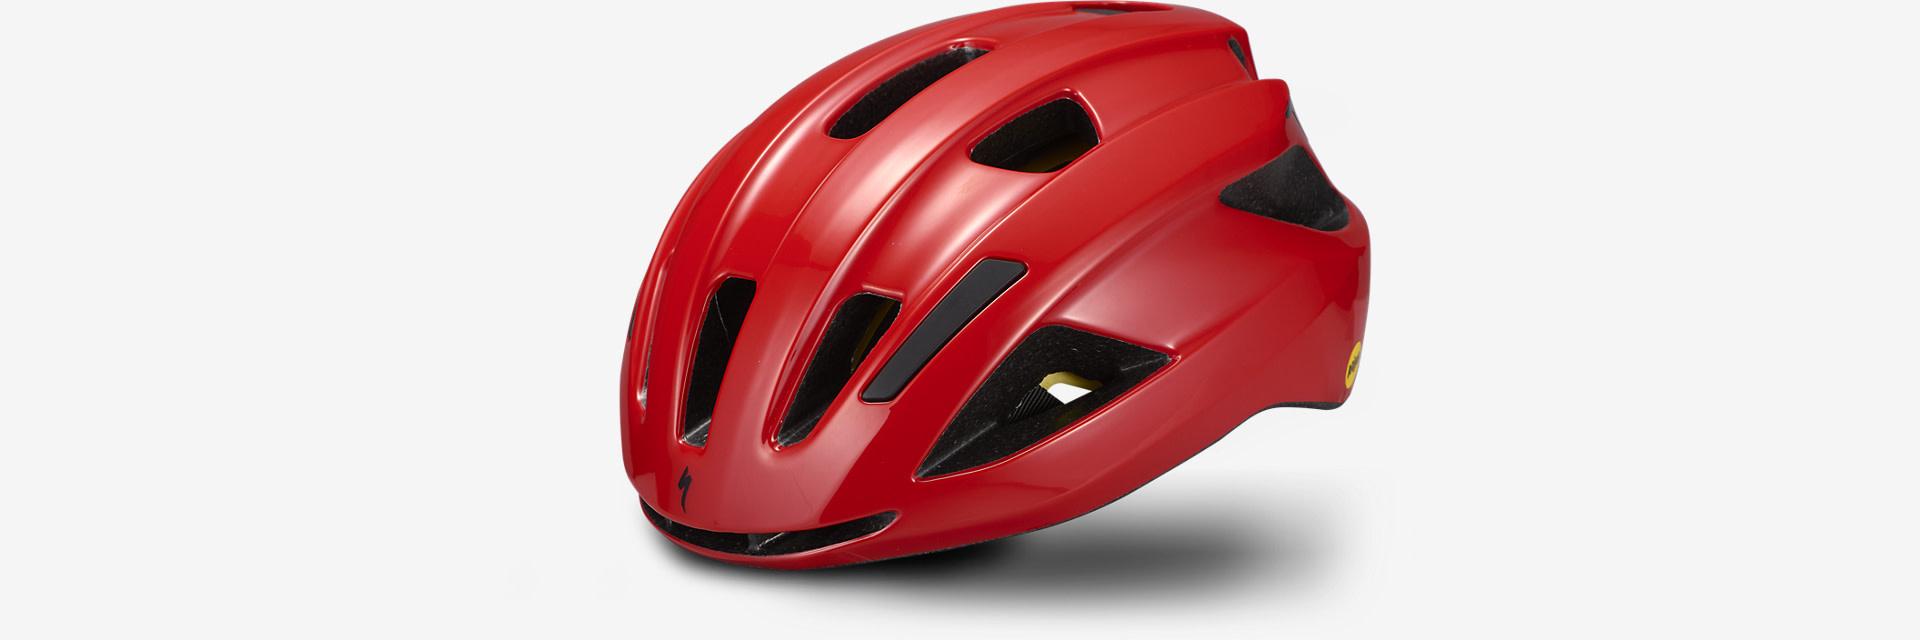 Specialized Helmet Align II MIPS M/L Flo Red